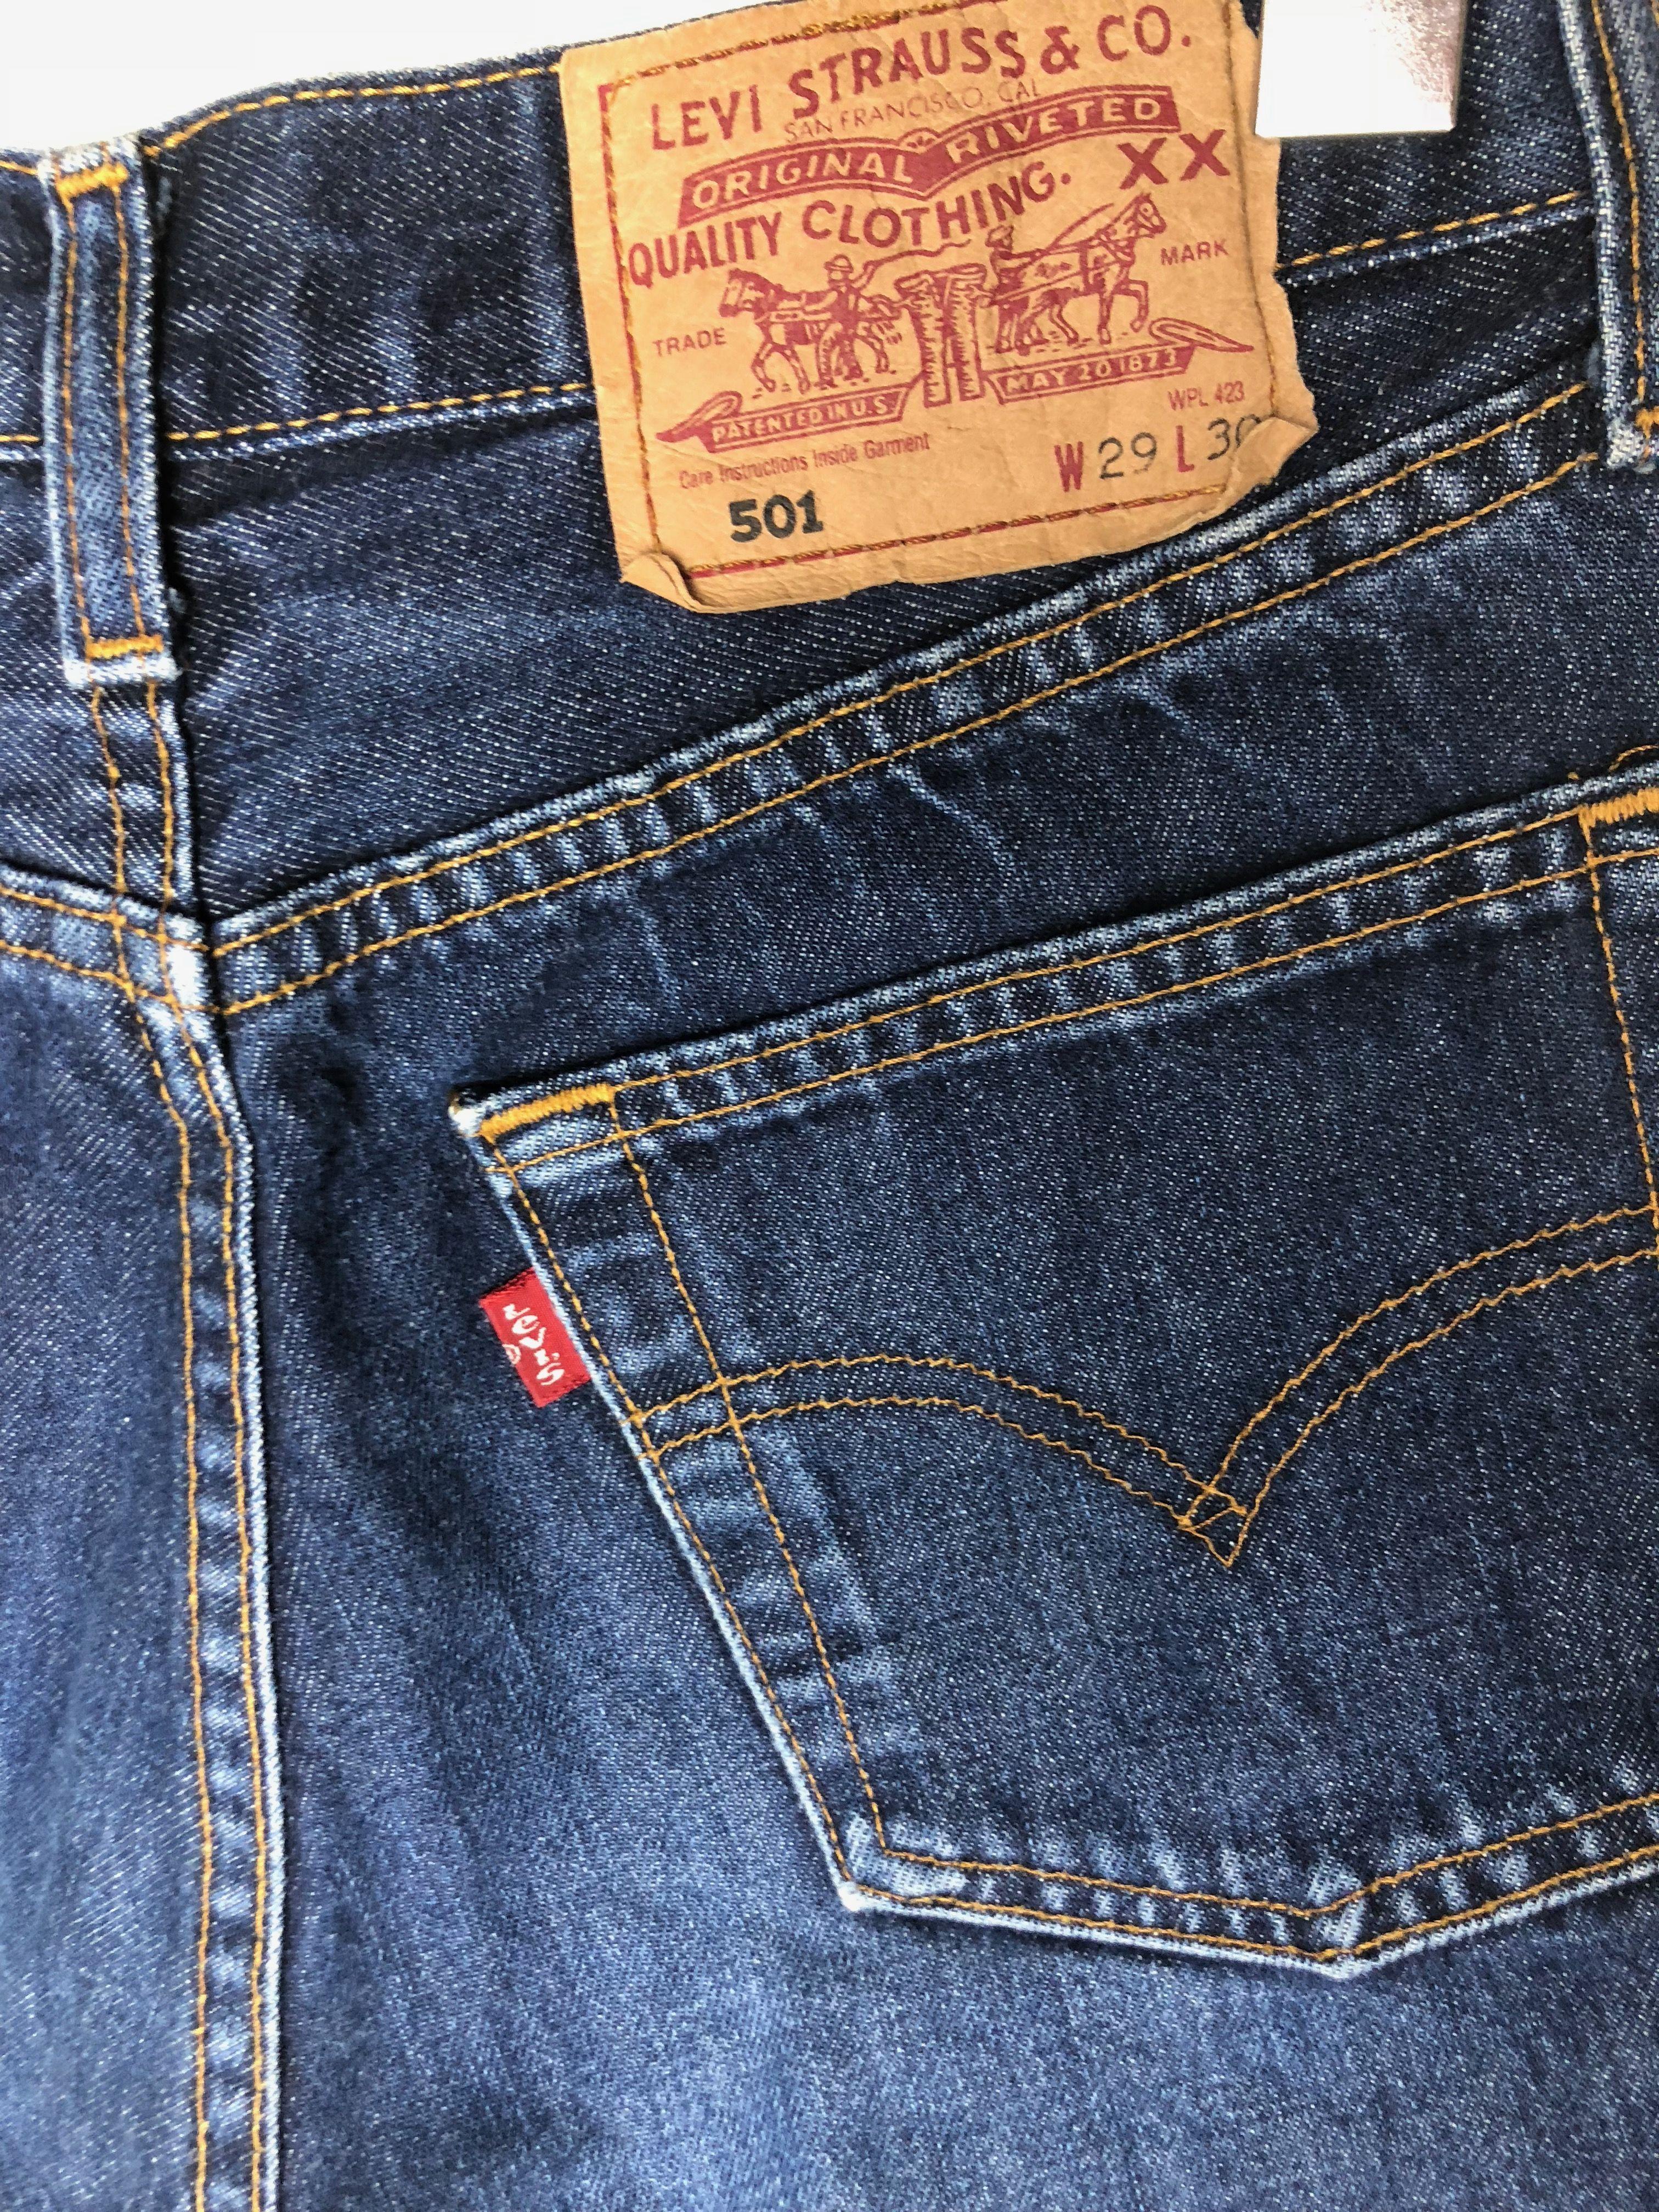 Shorts - Short Levi's 501